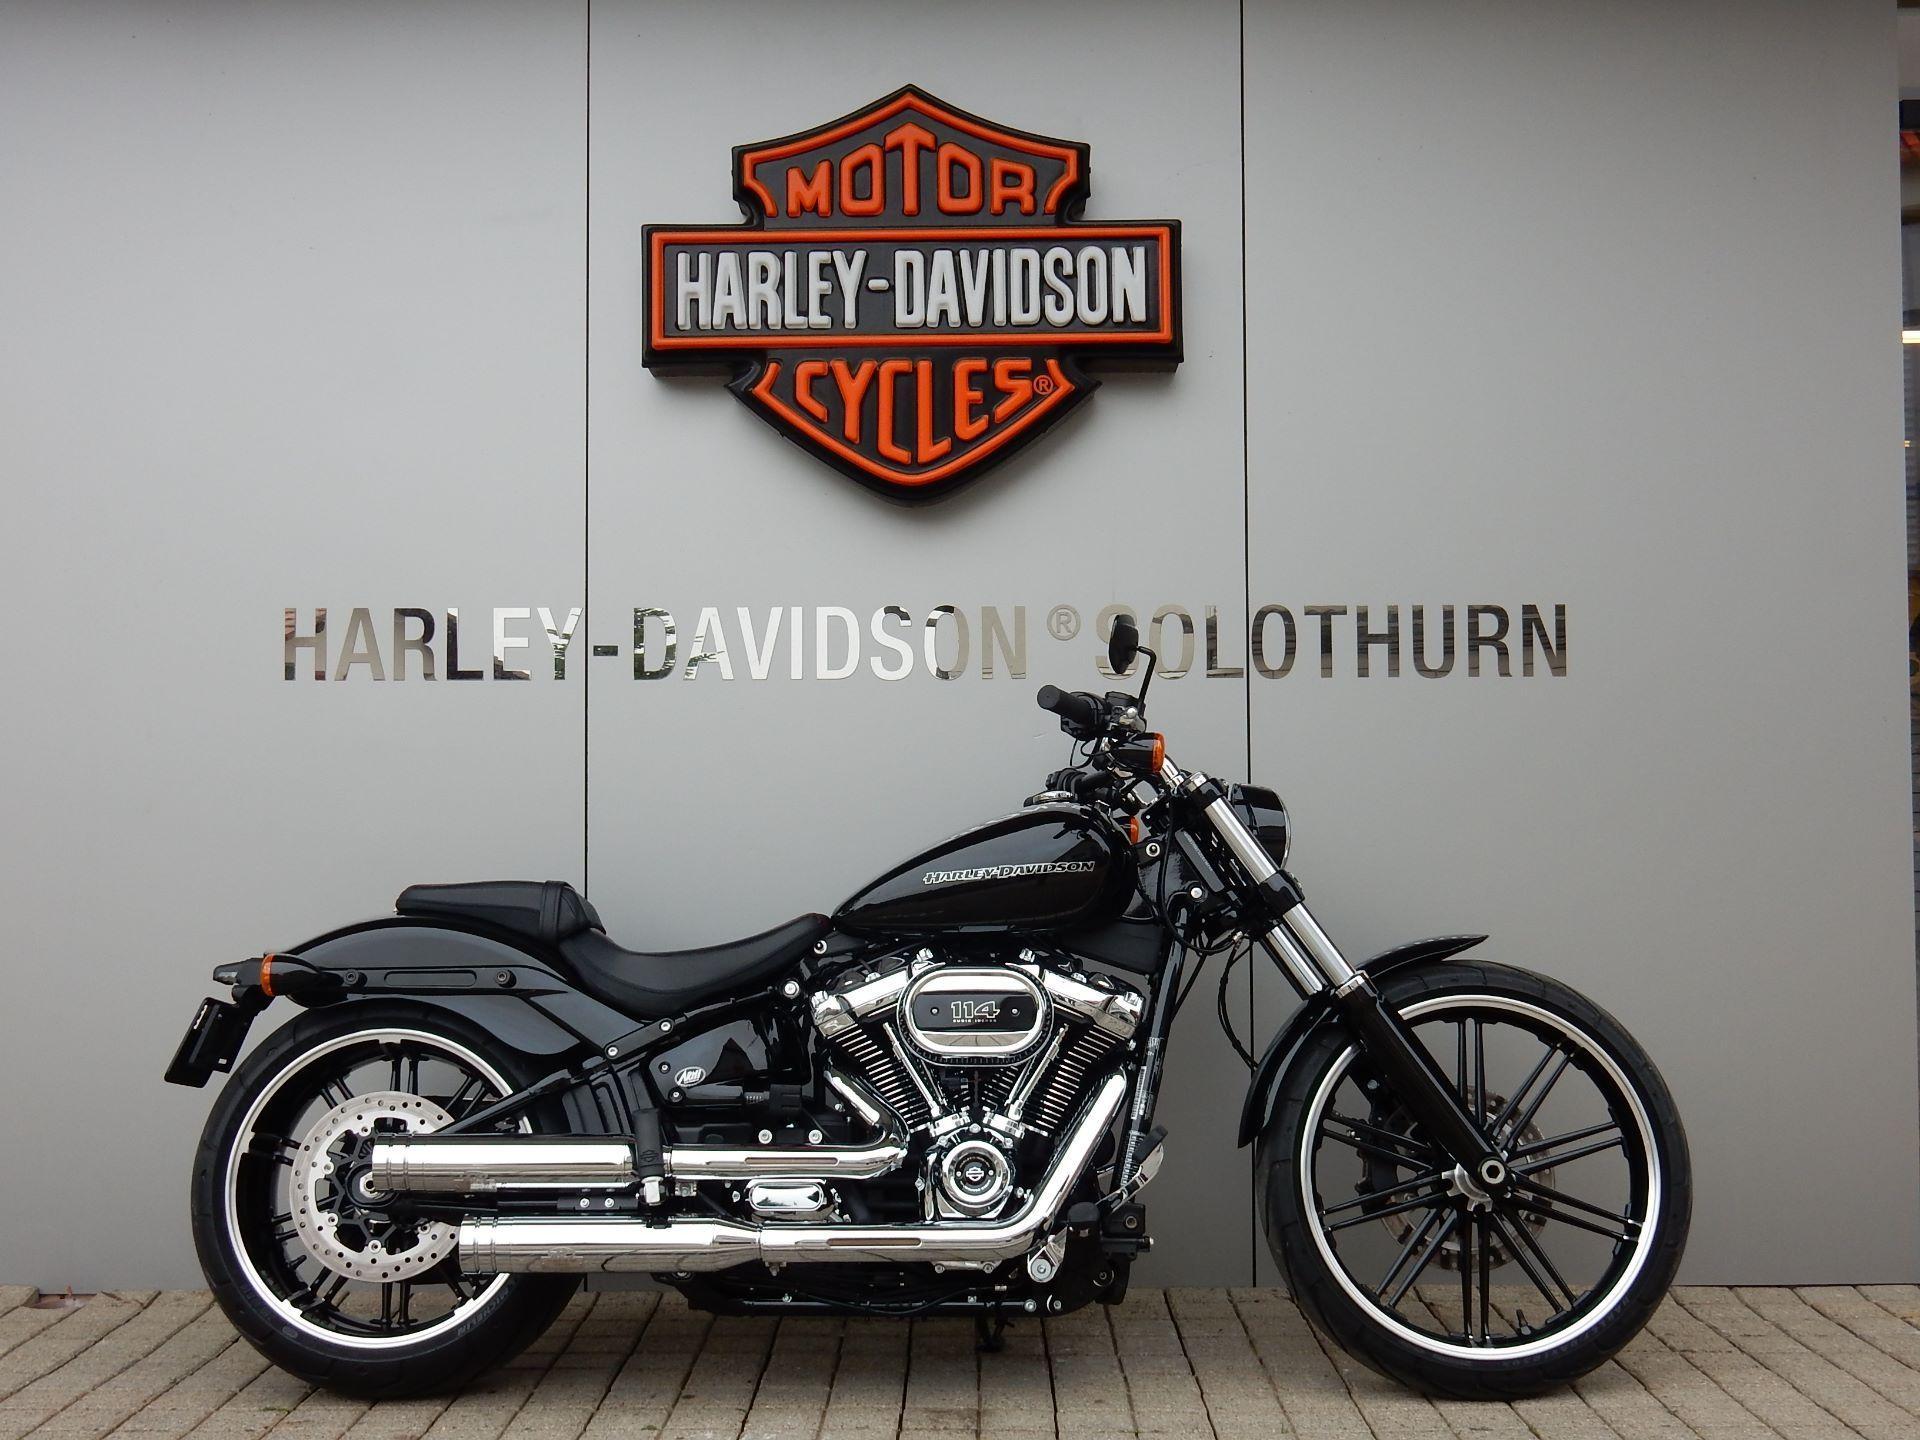 Motorrad Mieten & Roller Mieten HARLEY-DAVIDSON FXSB 1690 Softail Breakout ABS